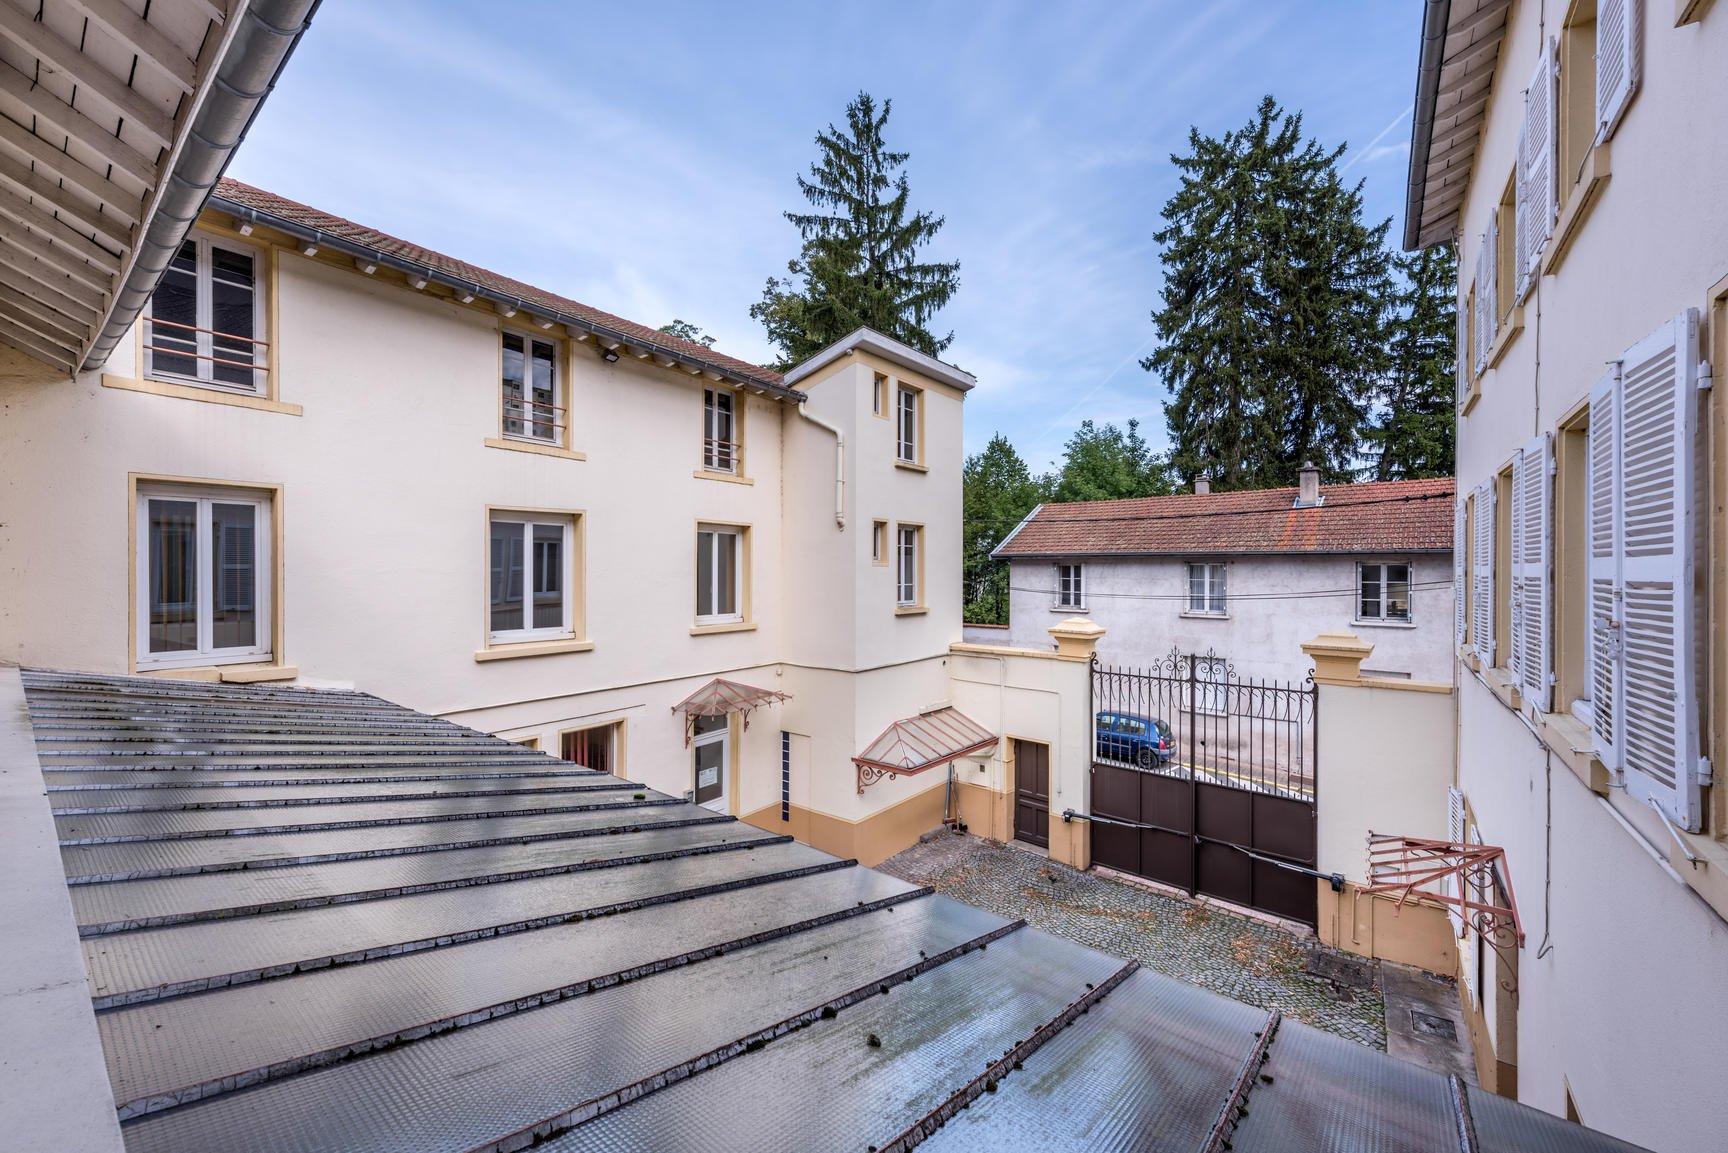 Vente Immeuble - Bourg-de-Thizy